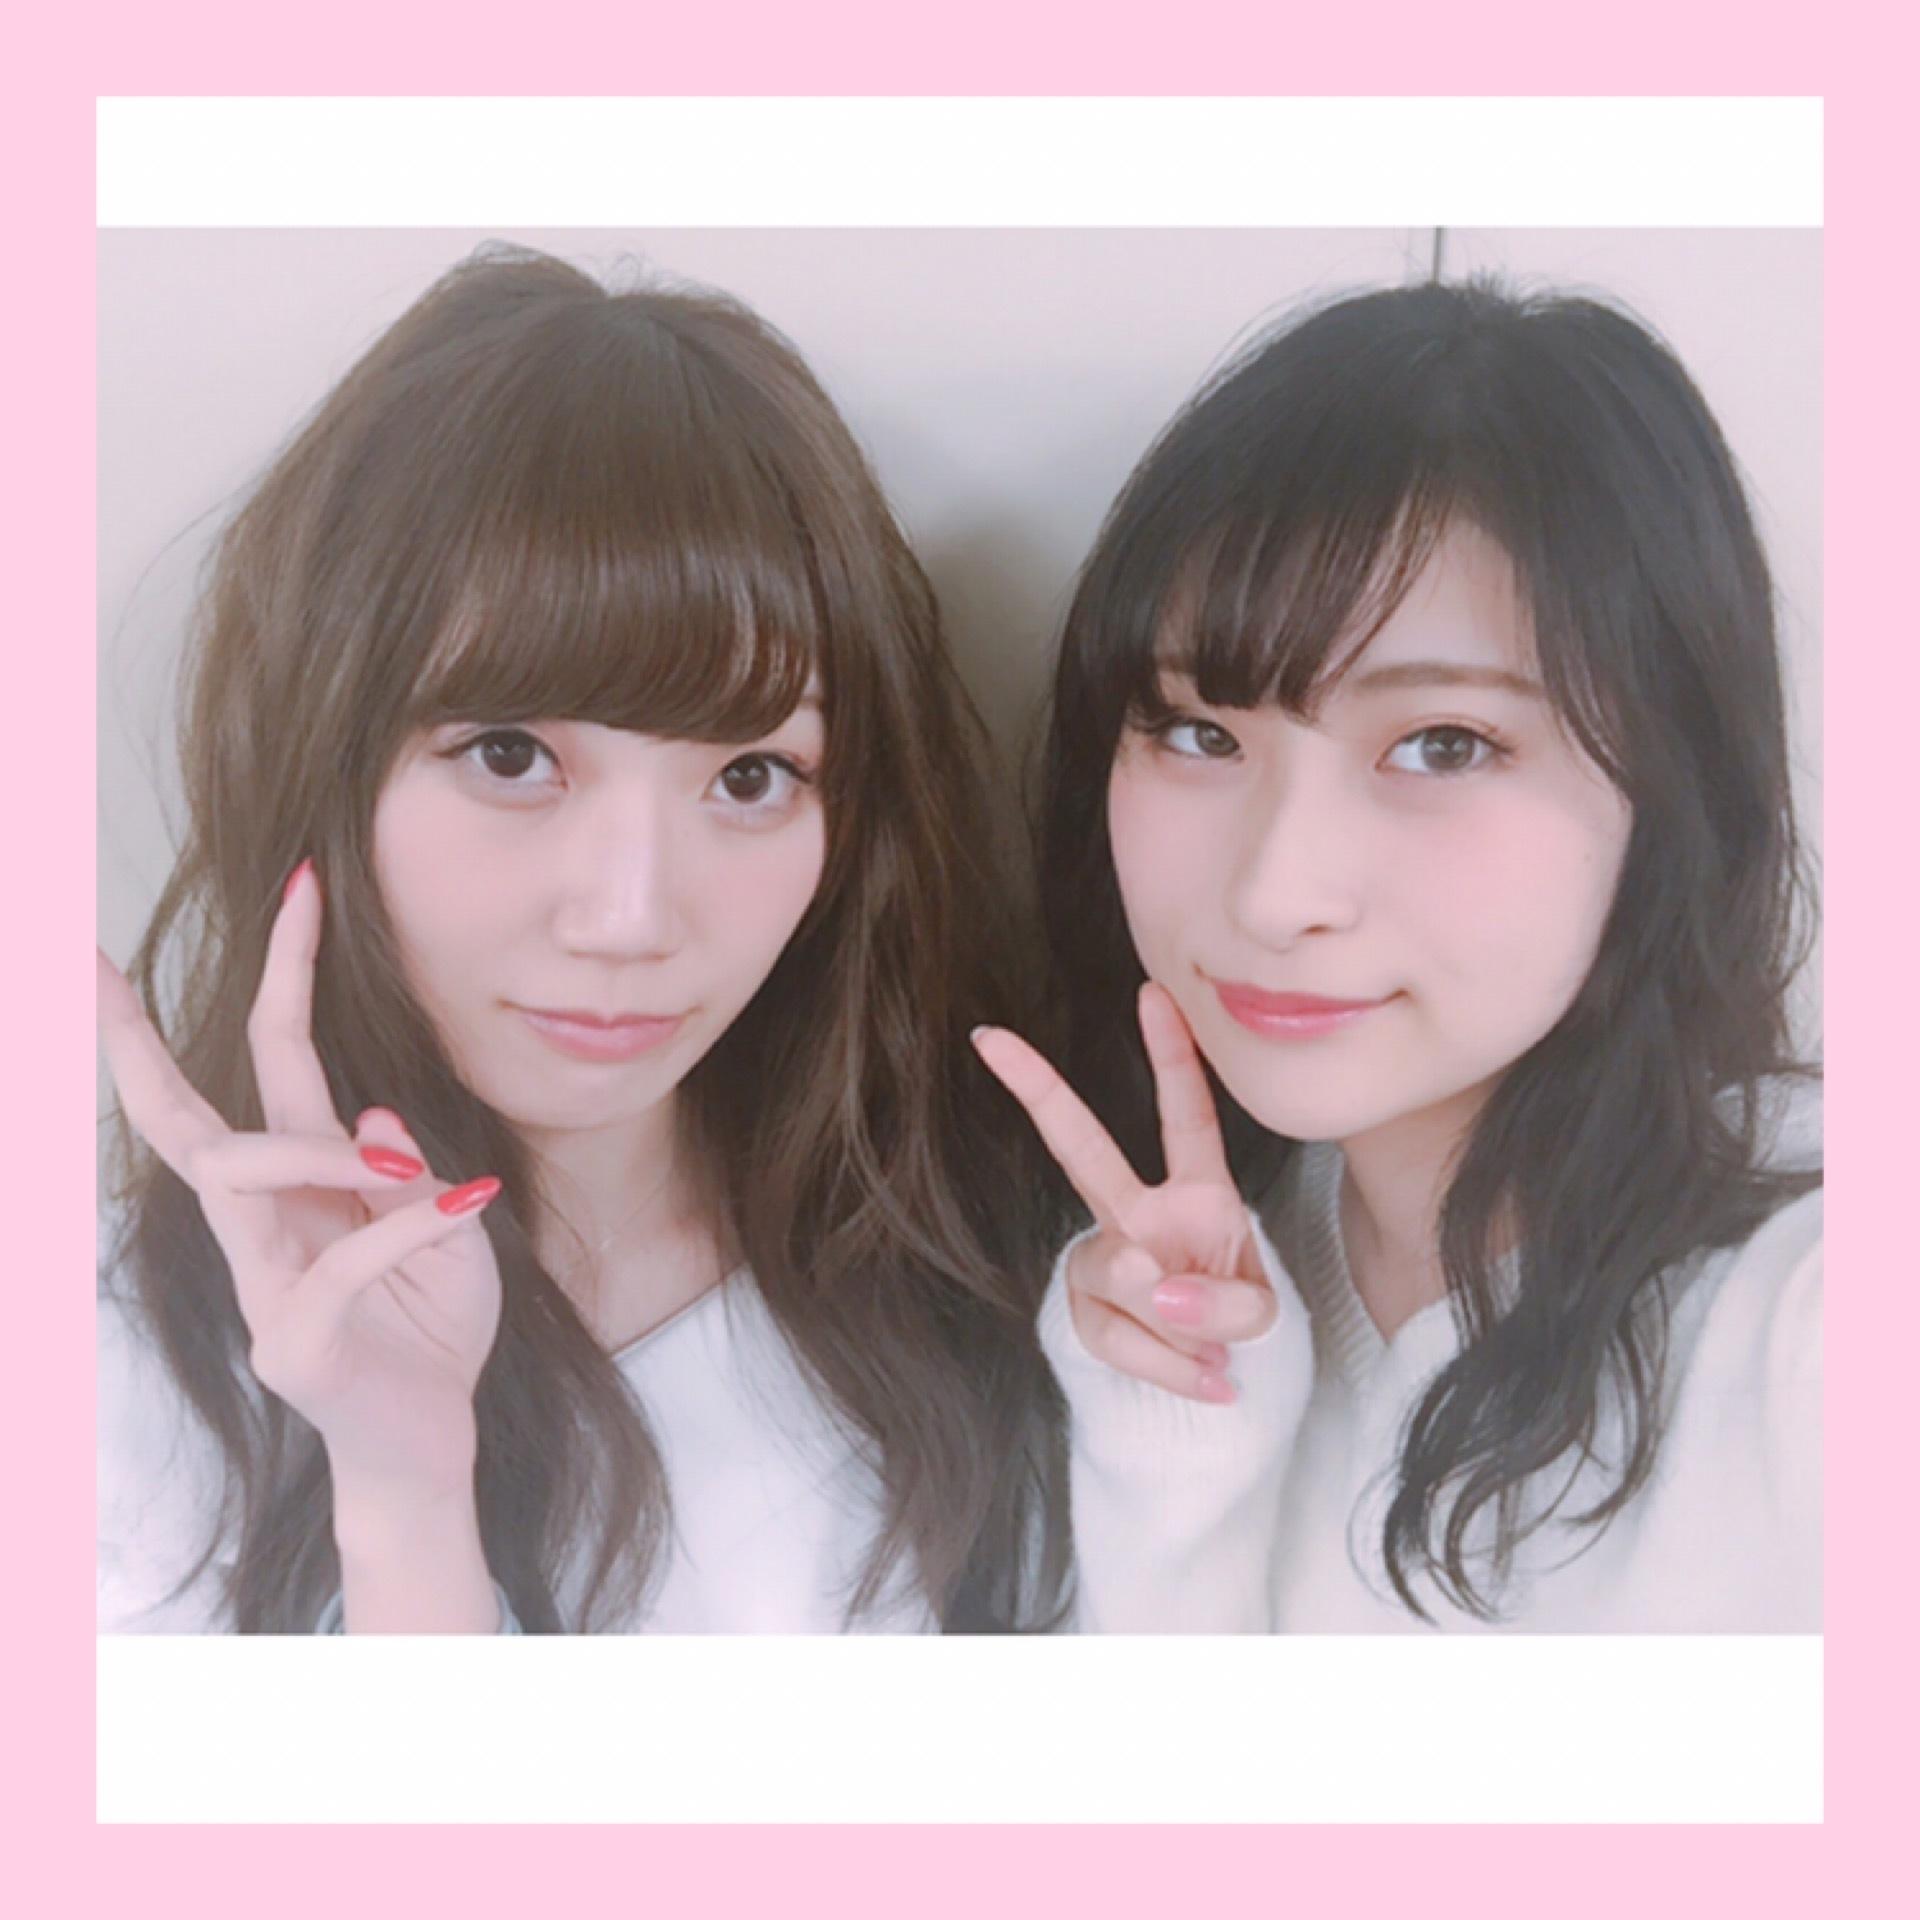 《 non-no 創刊45周年記念イベント ファイナル! 》_1_1